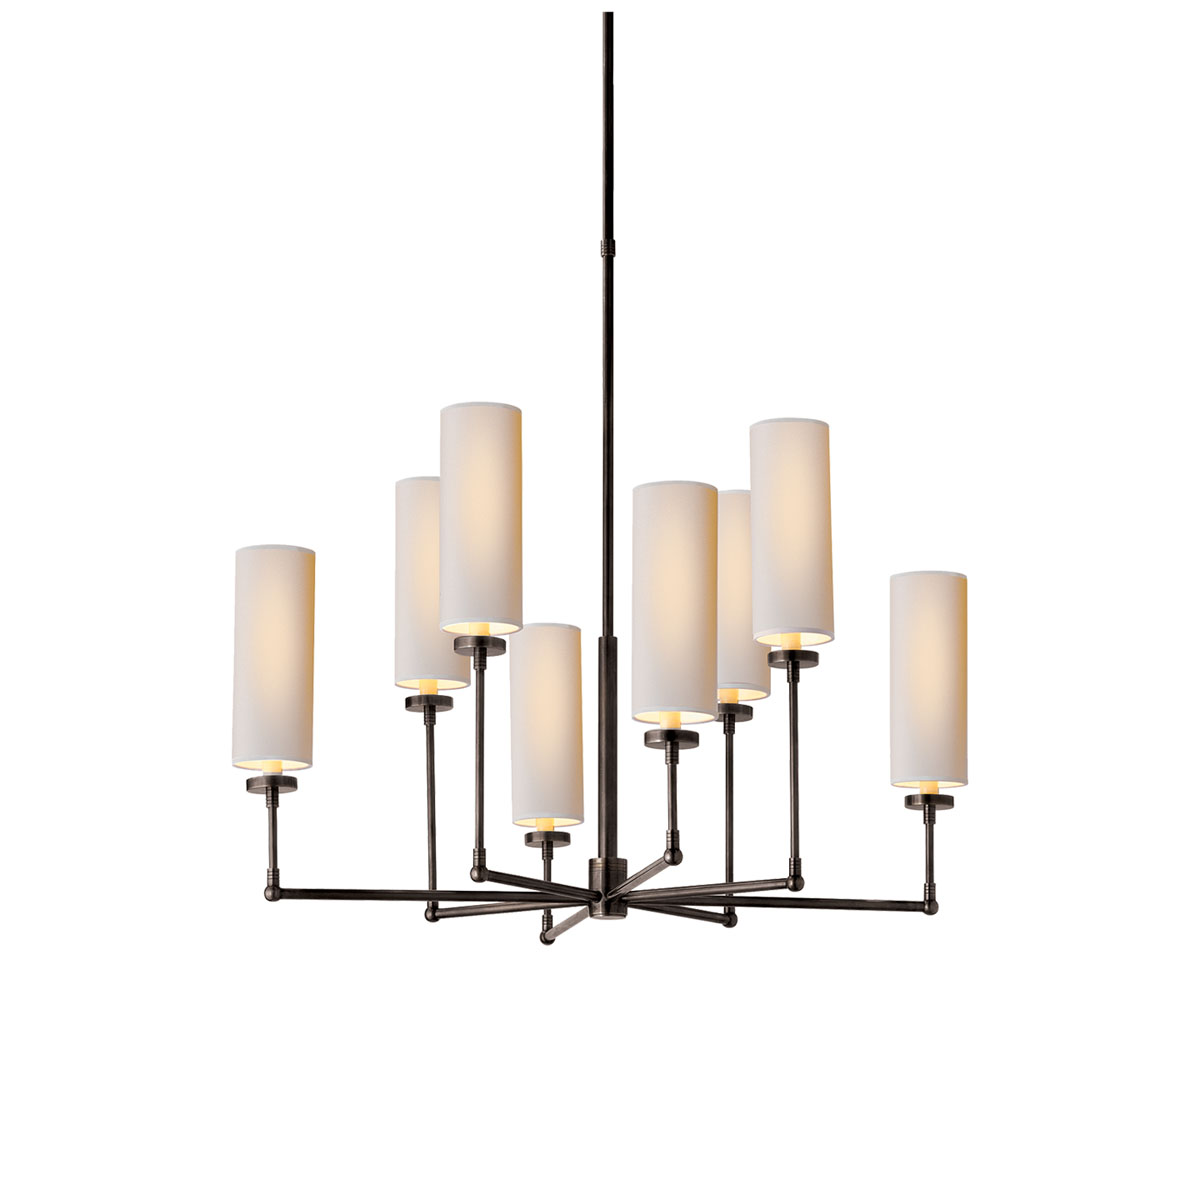 Visual comfort large ziyi chandelier chandelier neenas lighting bronze with wax finish natural paper shade chevronleft large ziyi chandelier arubaitofo Gallery